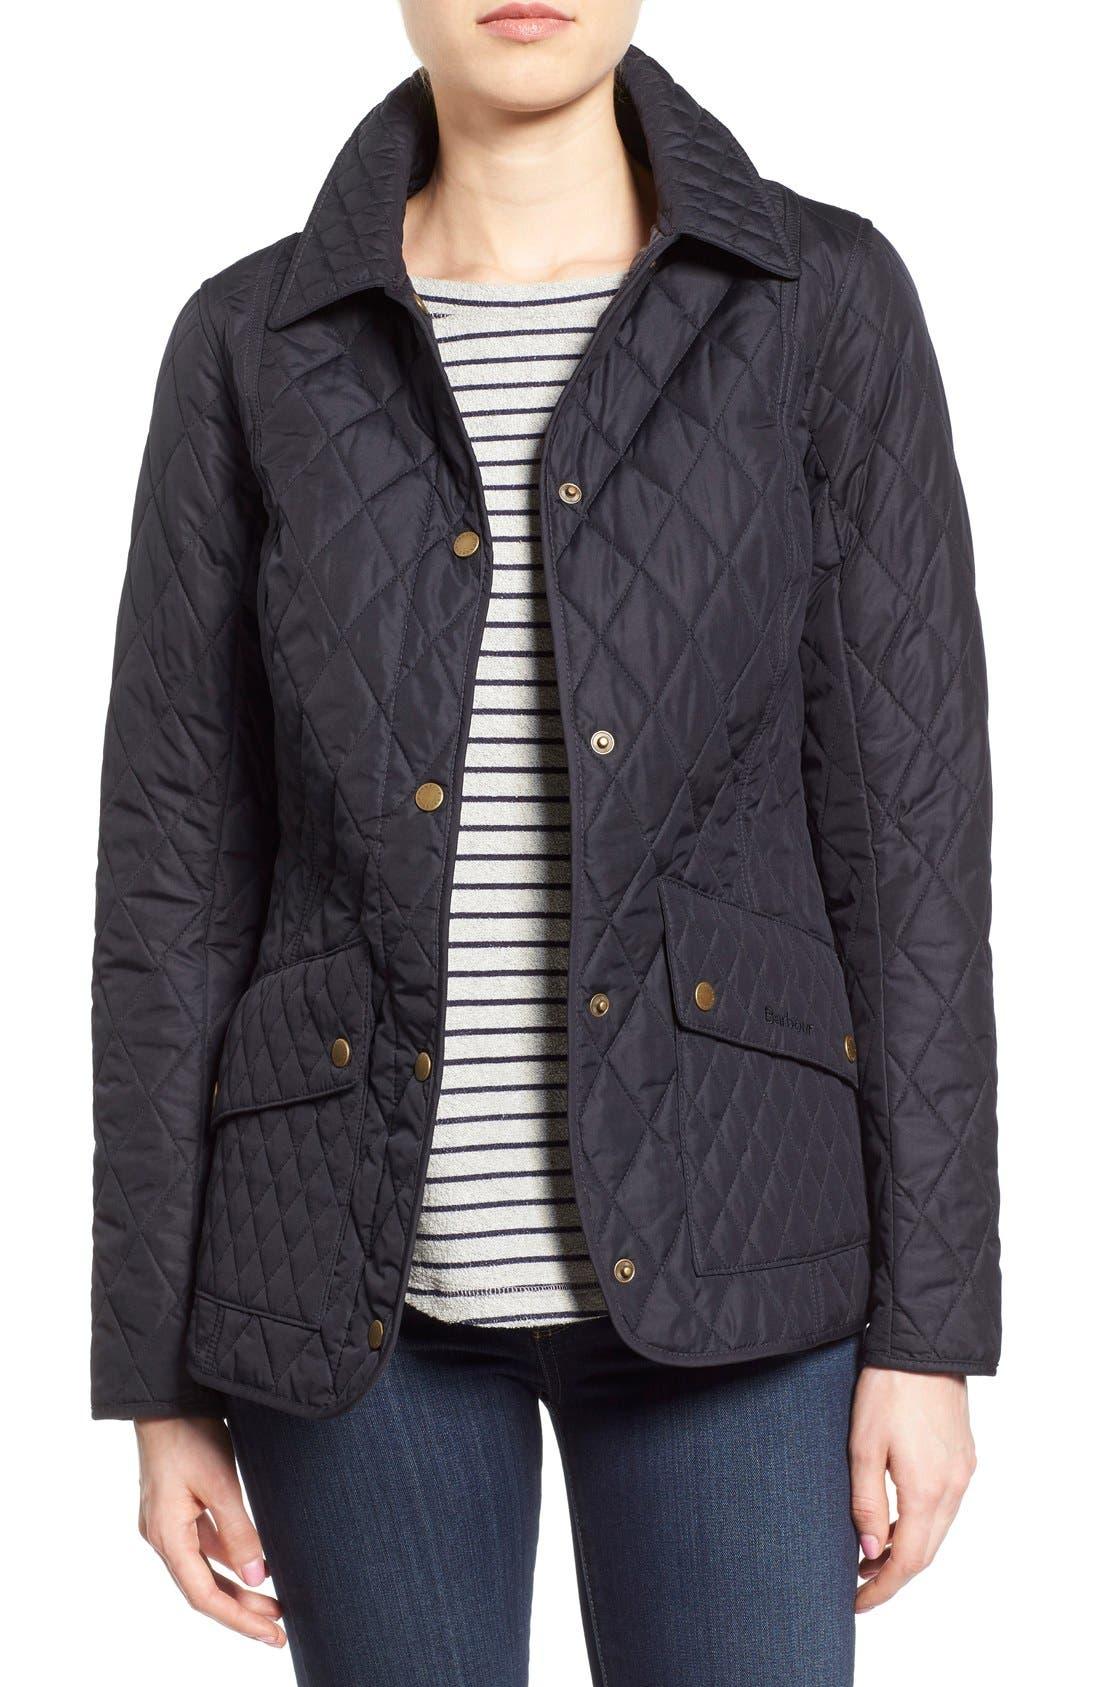 Main Image - Barbour 'Herterton' Lightweight Diamond Quilt Jacket